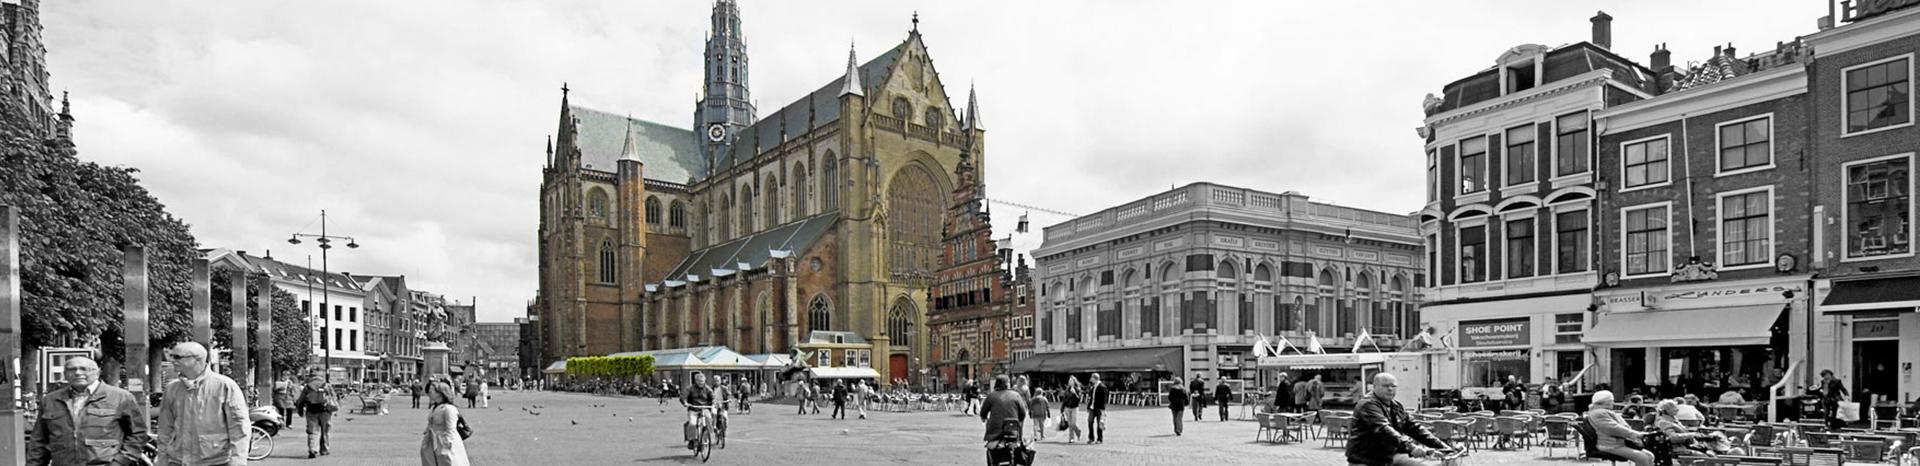 Letselschade advocaat Haarlem | LetselPro